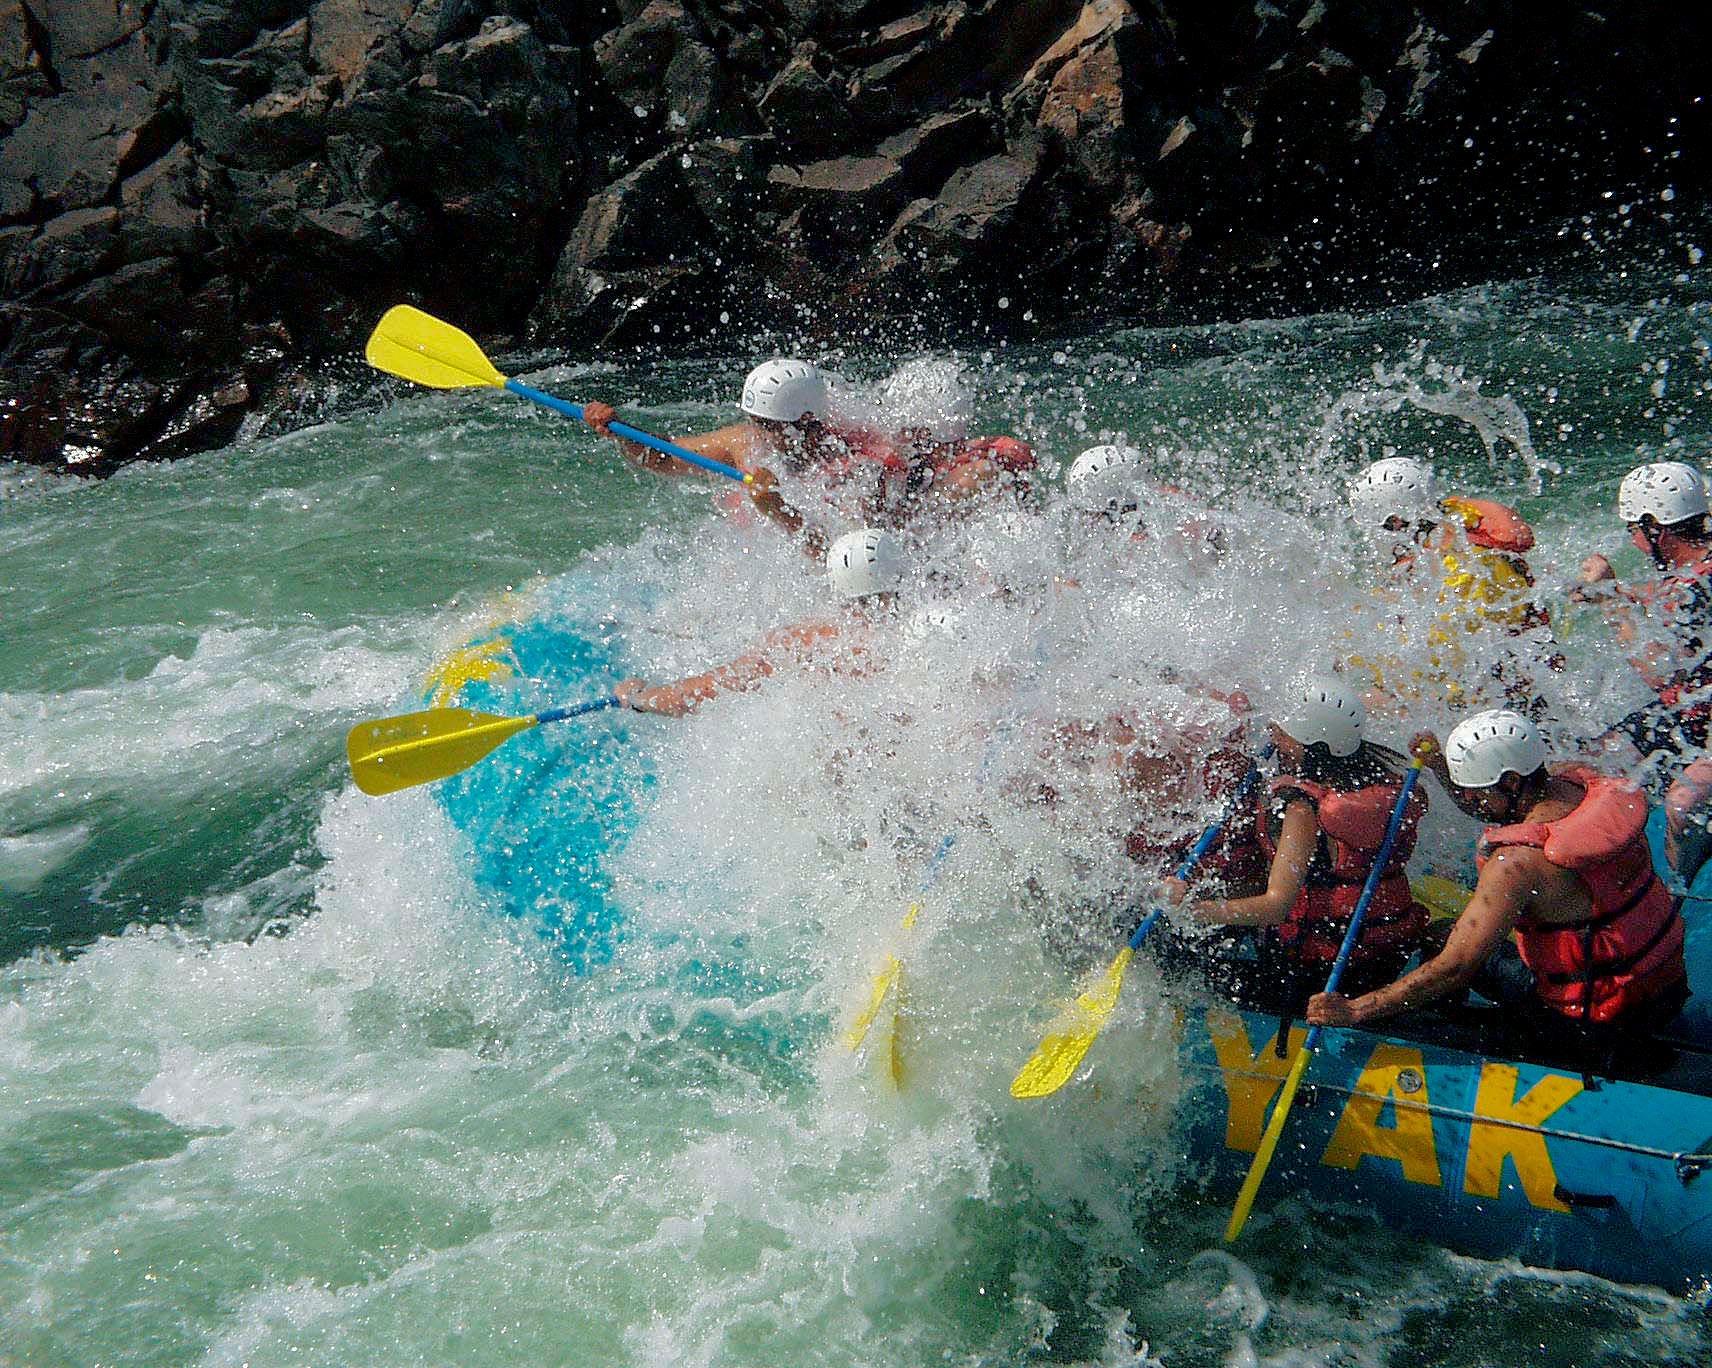 river_rafting_fraser_river_british_columbia.jpg